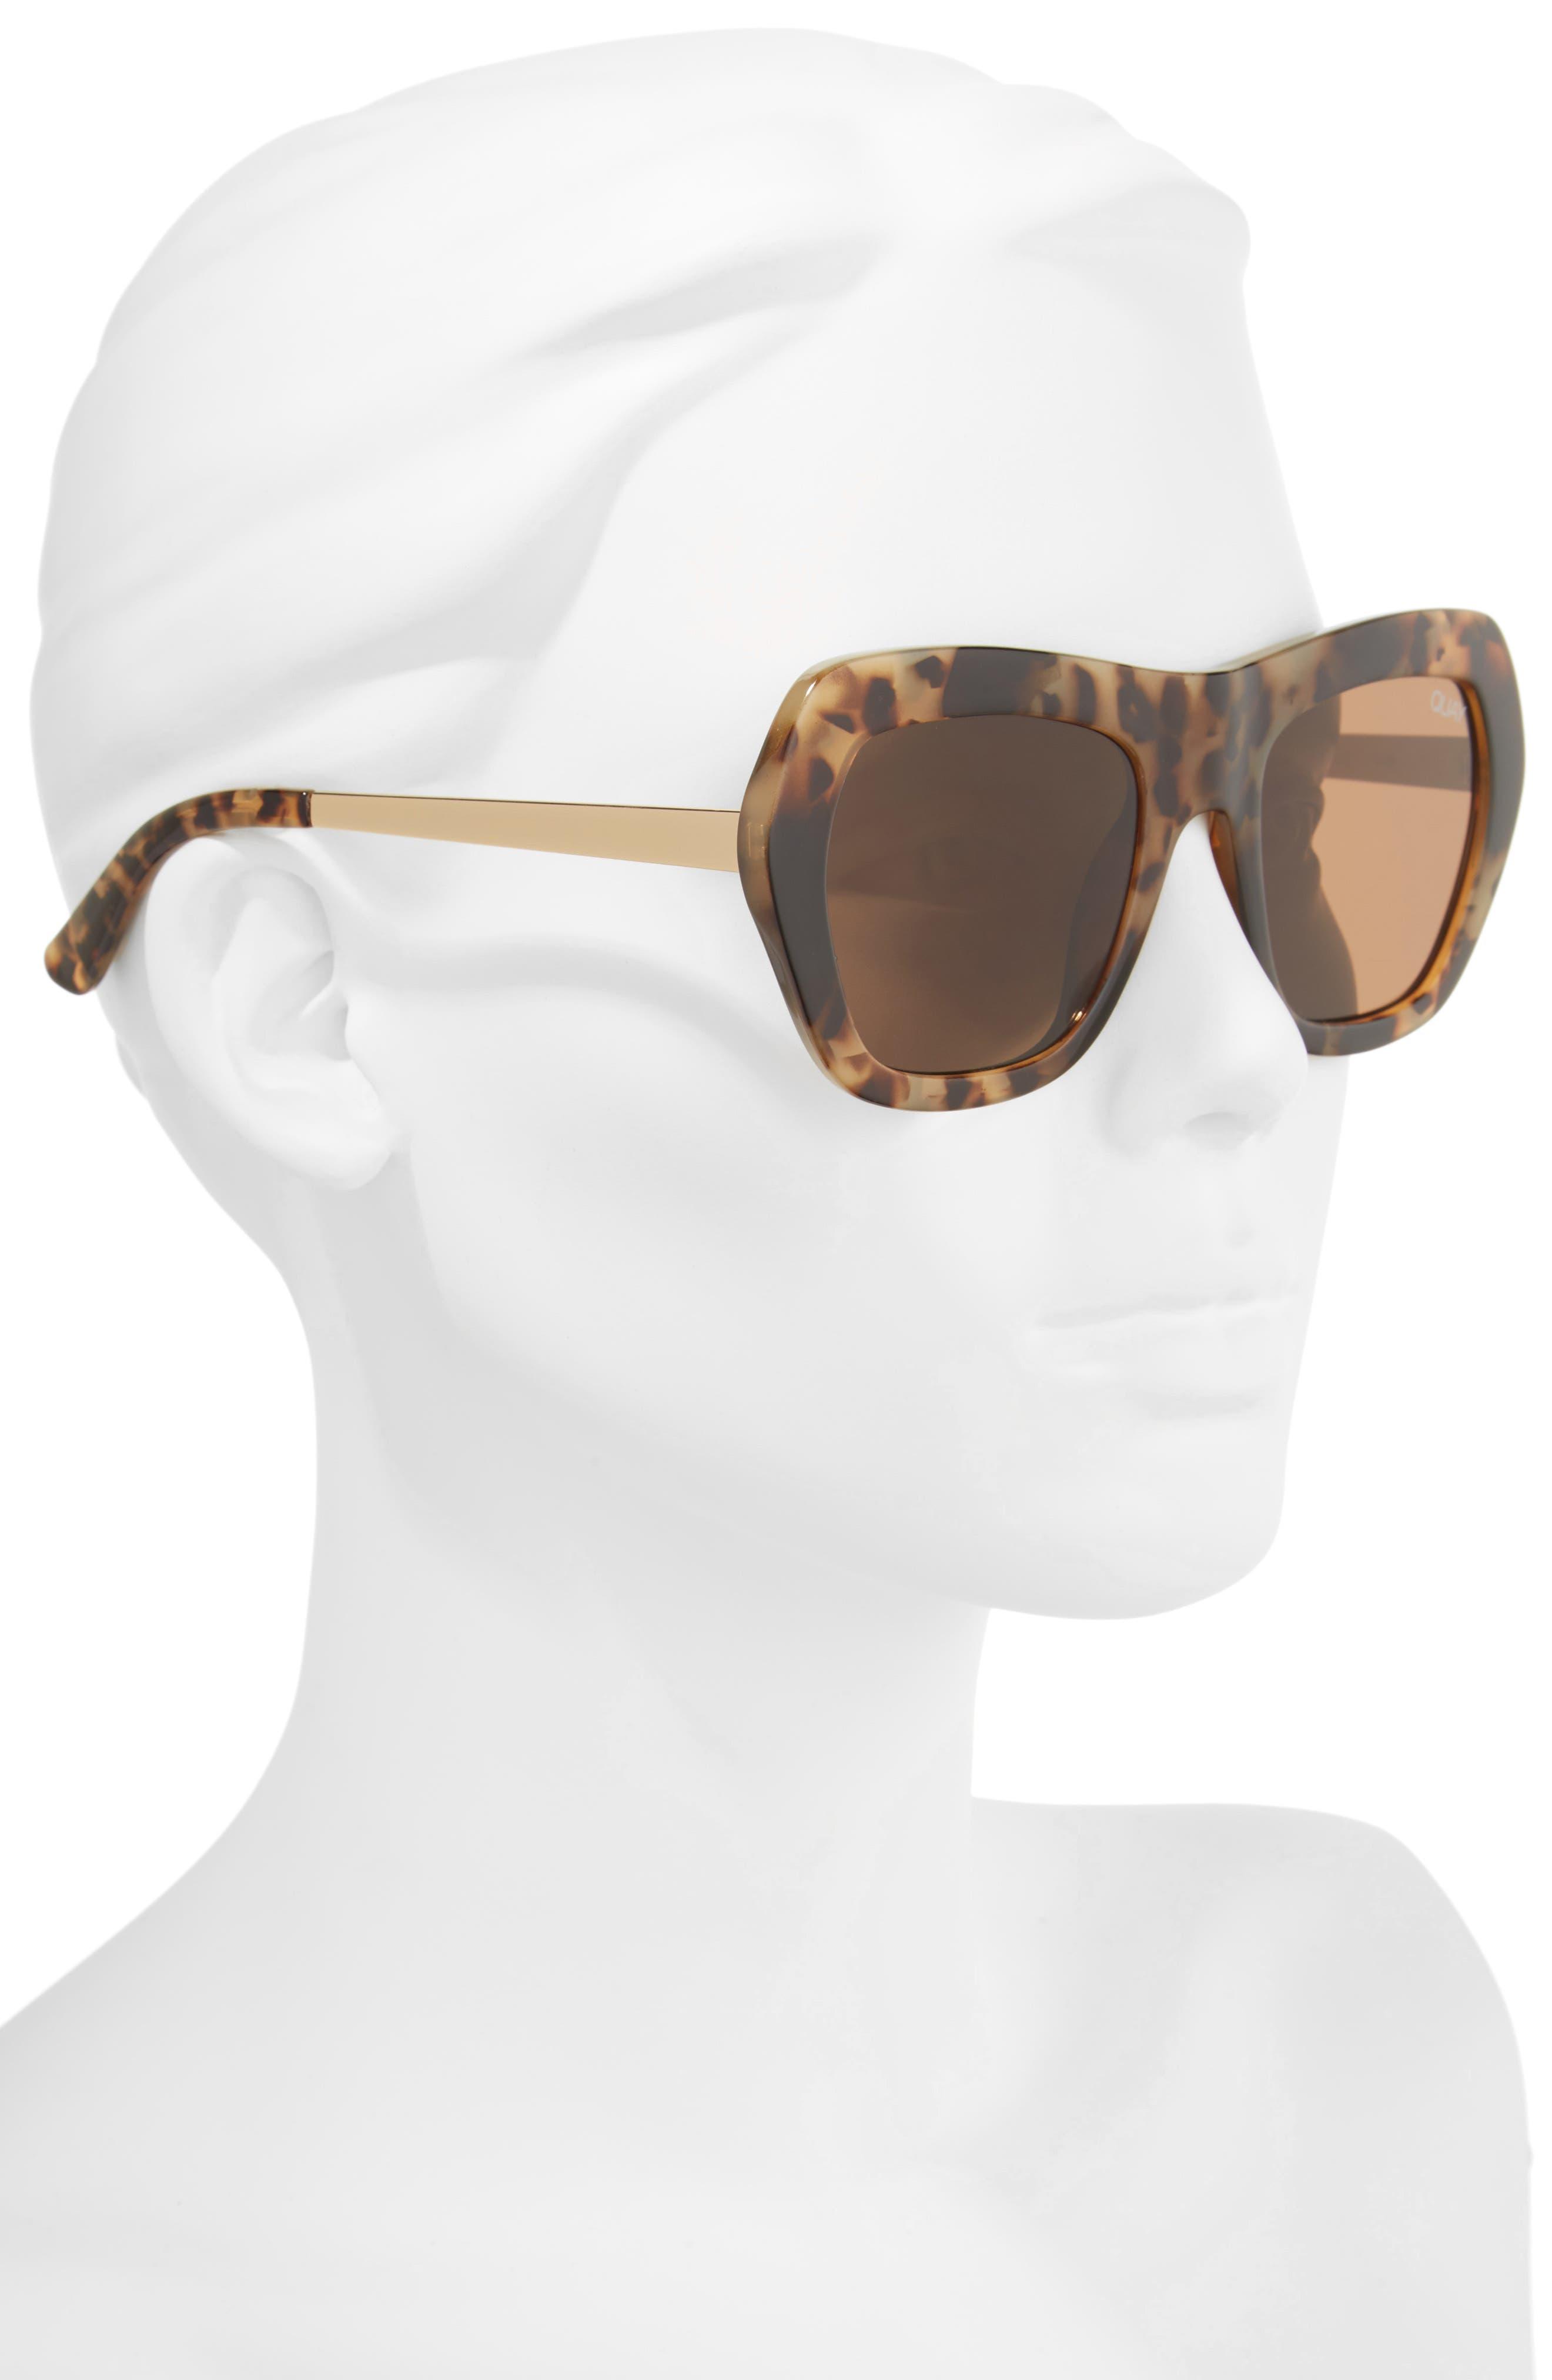 Common Love 53mm Square Sunglasses,                             Alternate thumbnail 4, color,